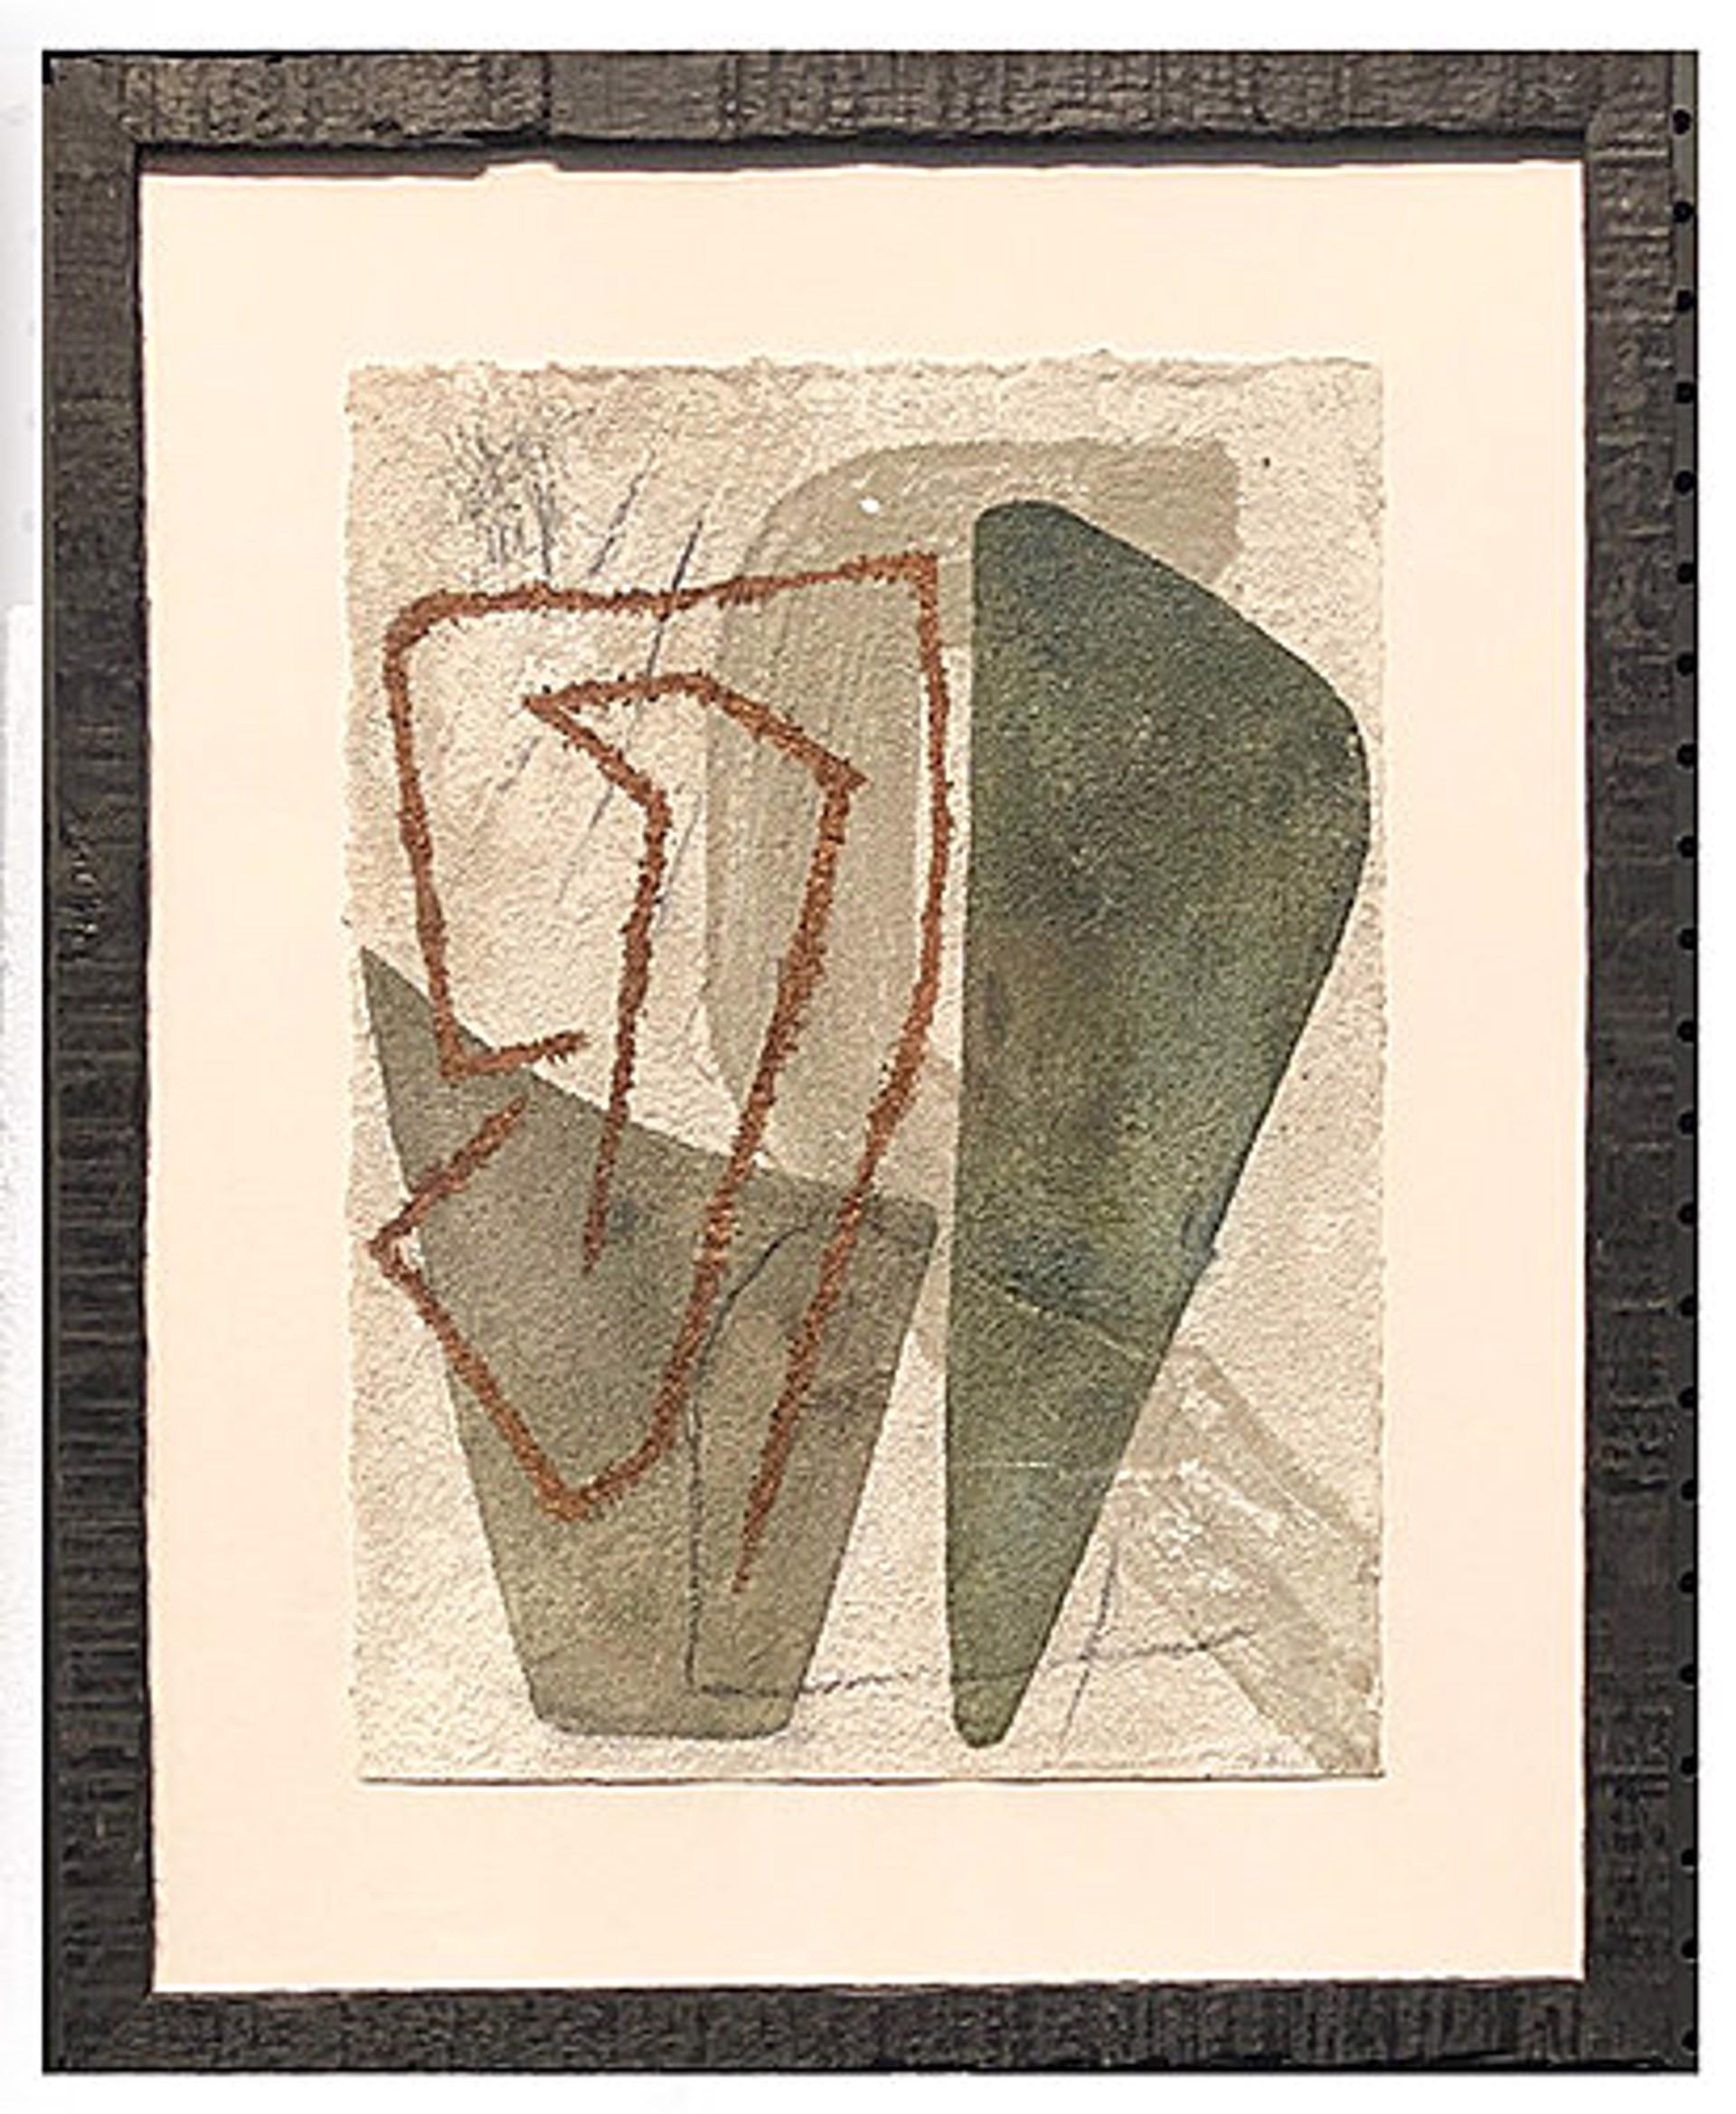 A Dollop of Uncertainty III by Stewart McDonald